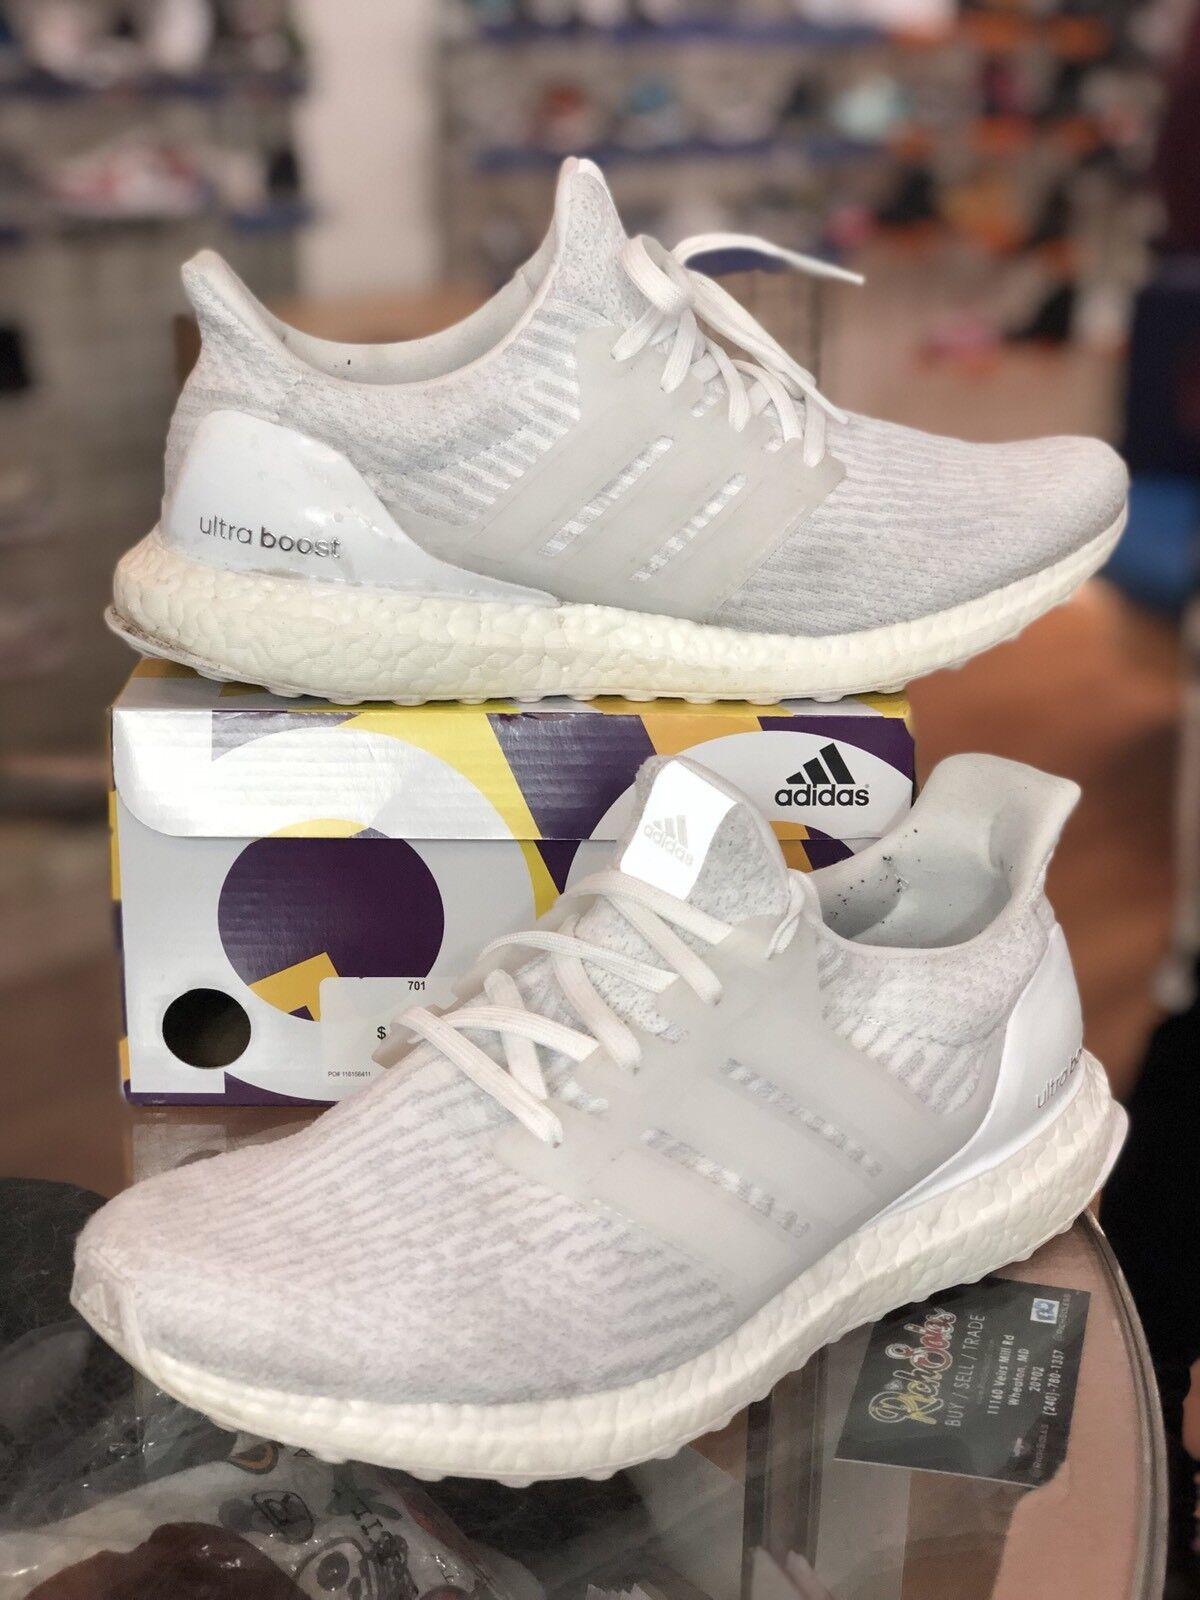 Adidas Ultra Boost Triple White 3.0 Running Uomo Running 3.0 BA8841 Size 9.5